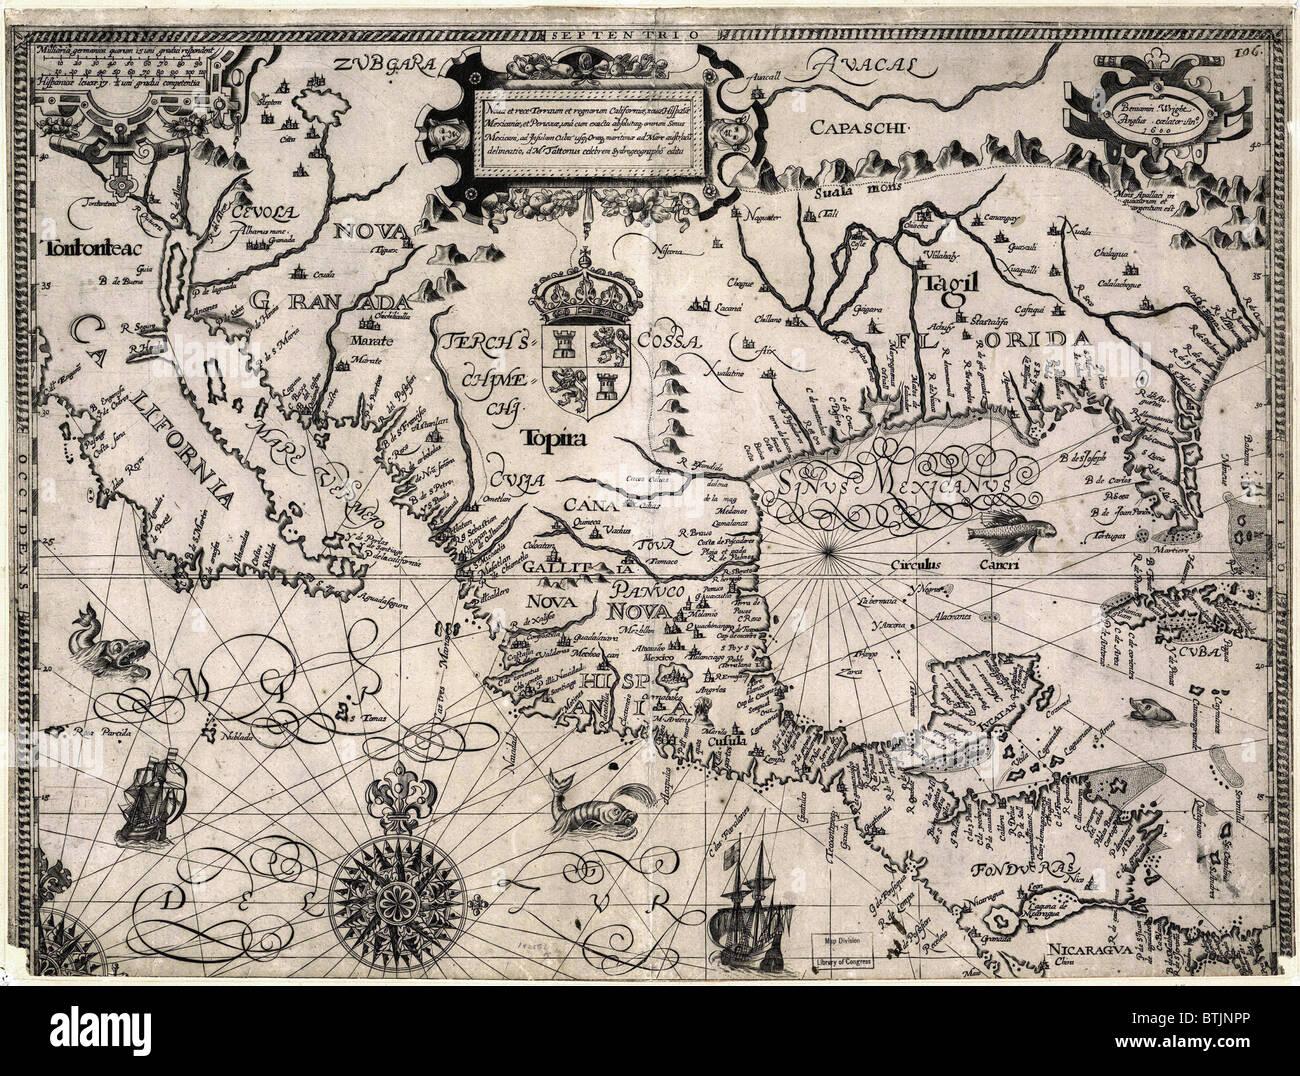 World Map 1600 Stock Photos & World Map 1600 Stock Images - Alamy